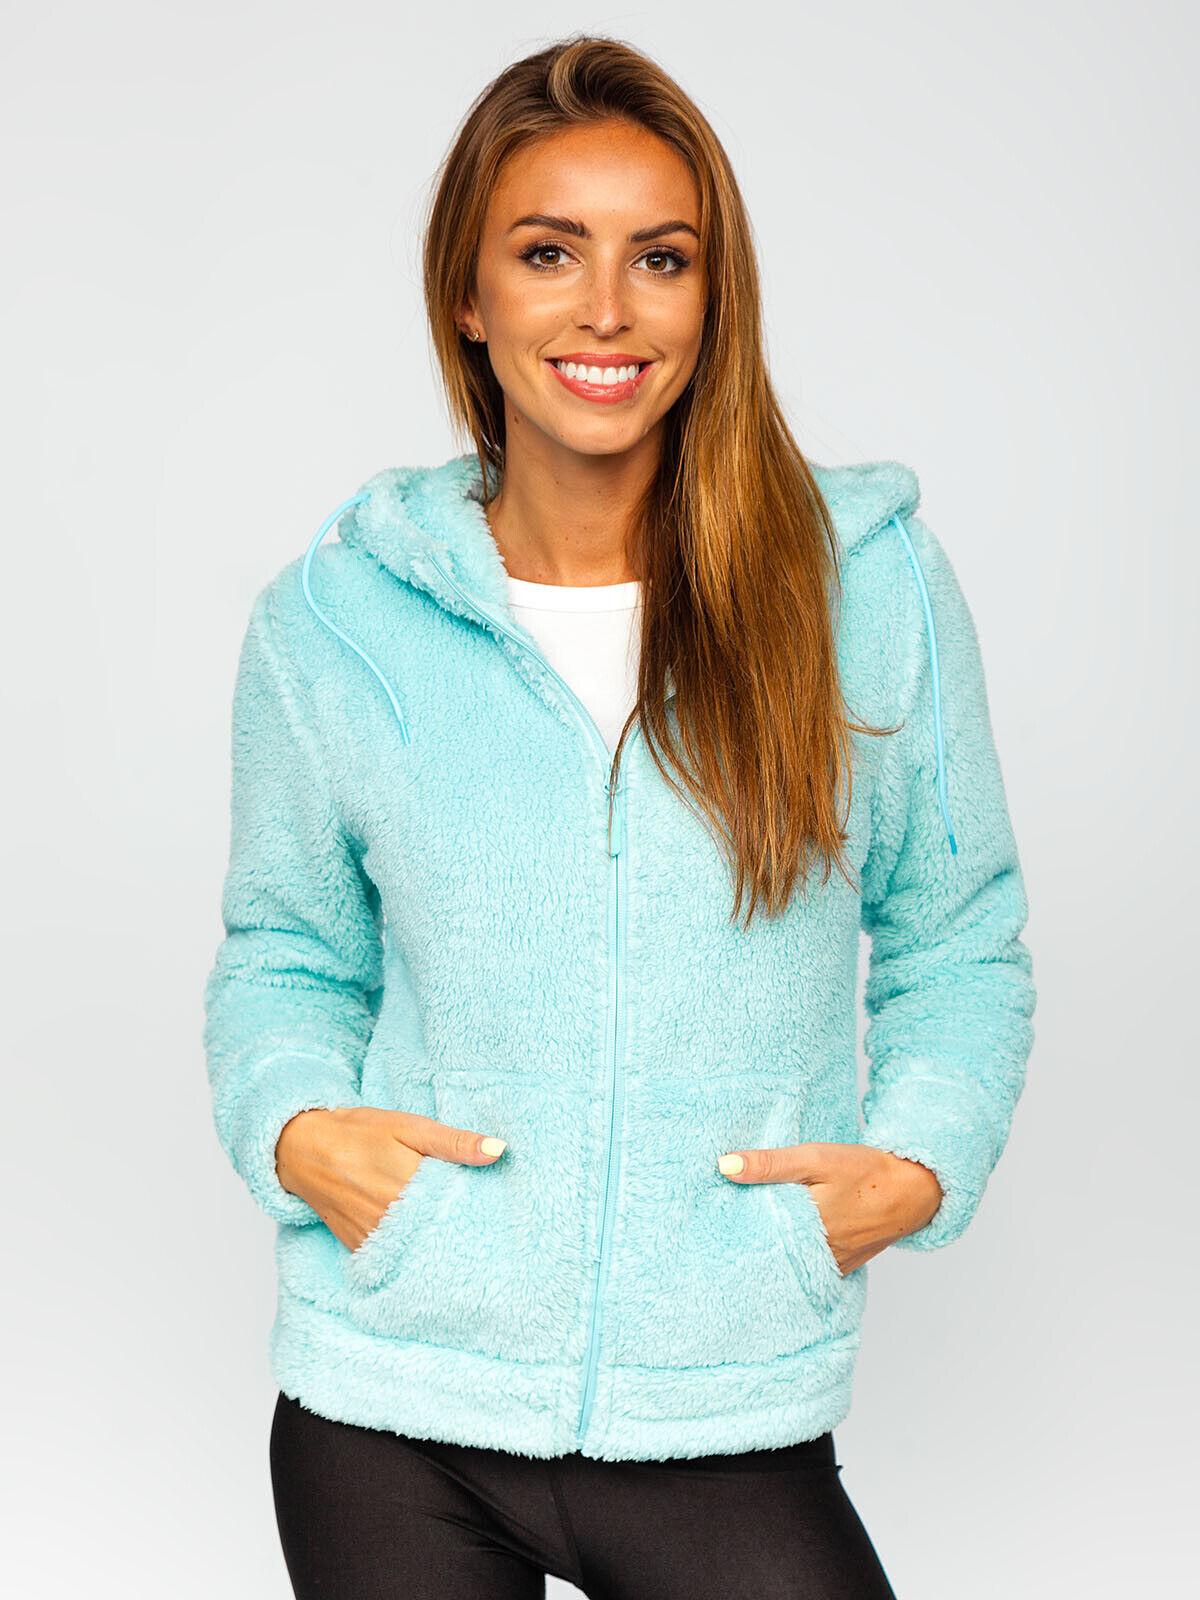 Fleecejacke Pullover Sweatshirt Classic Übergangs Kapuze Damen Mix BOLF Motiv